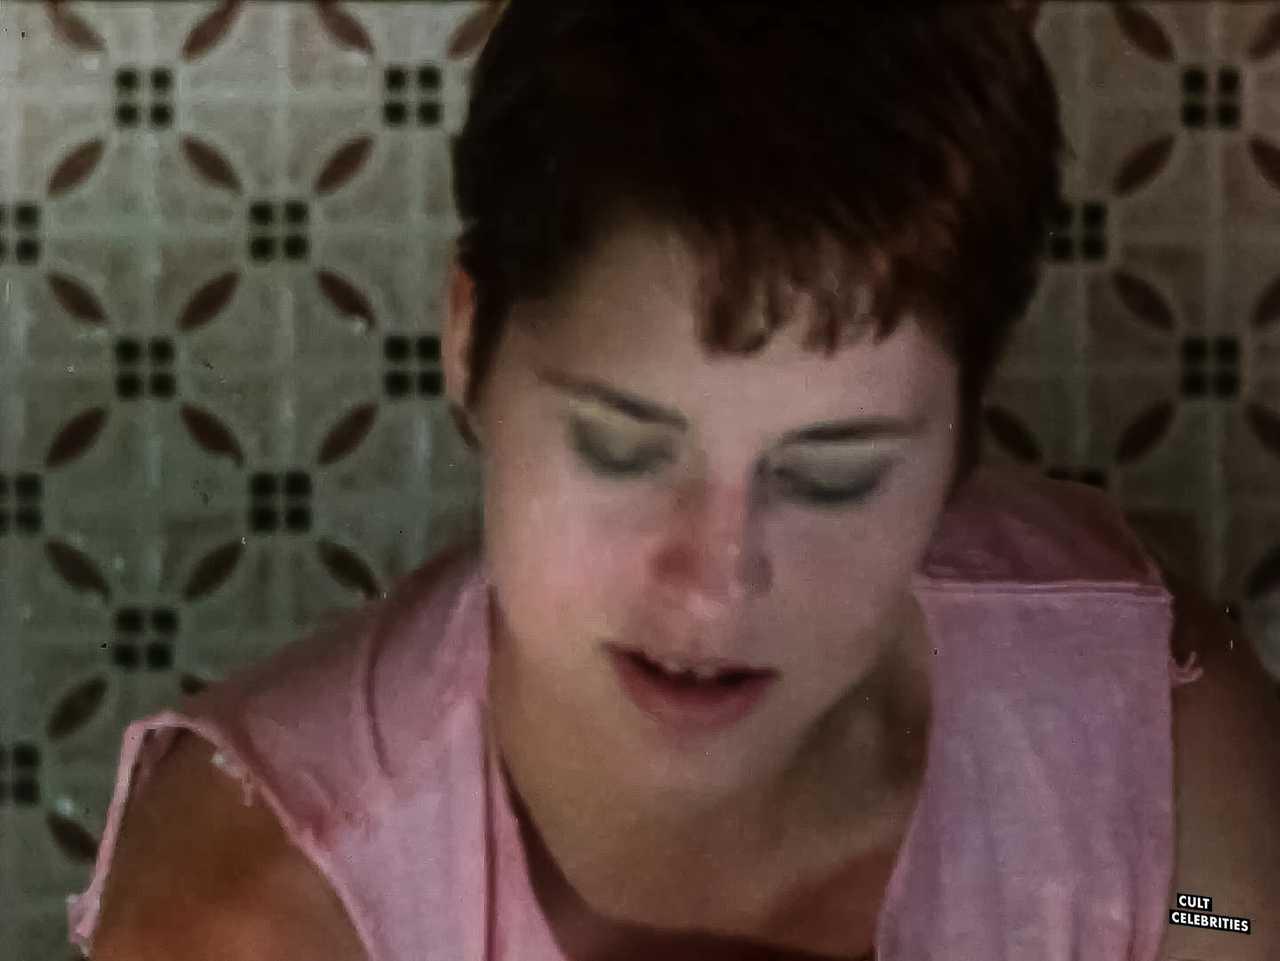 Debi Thibeault in Psychos in Love (1987)